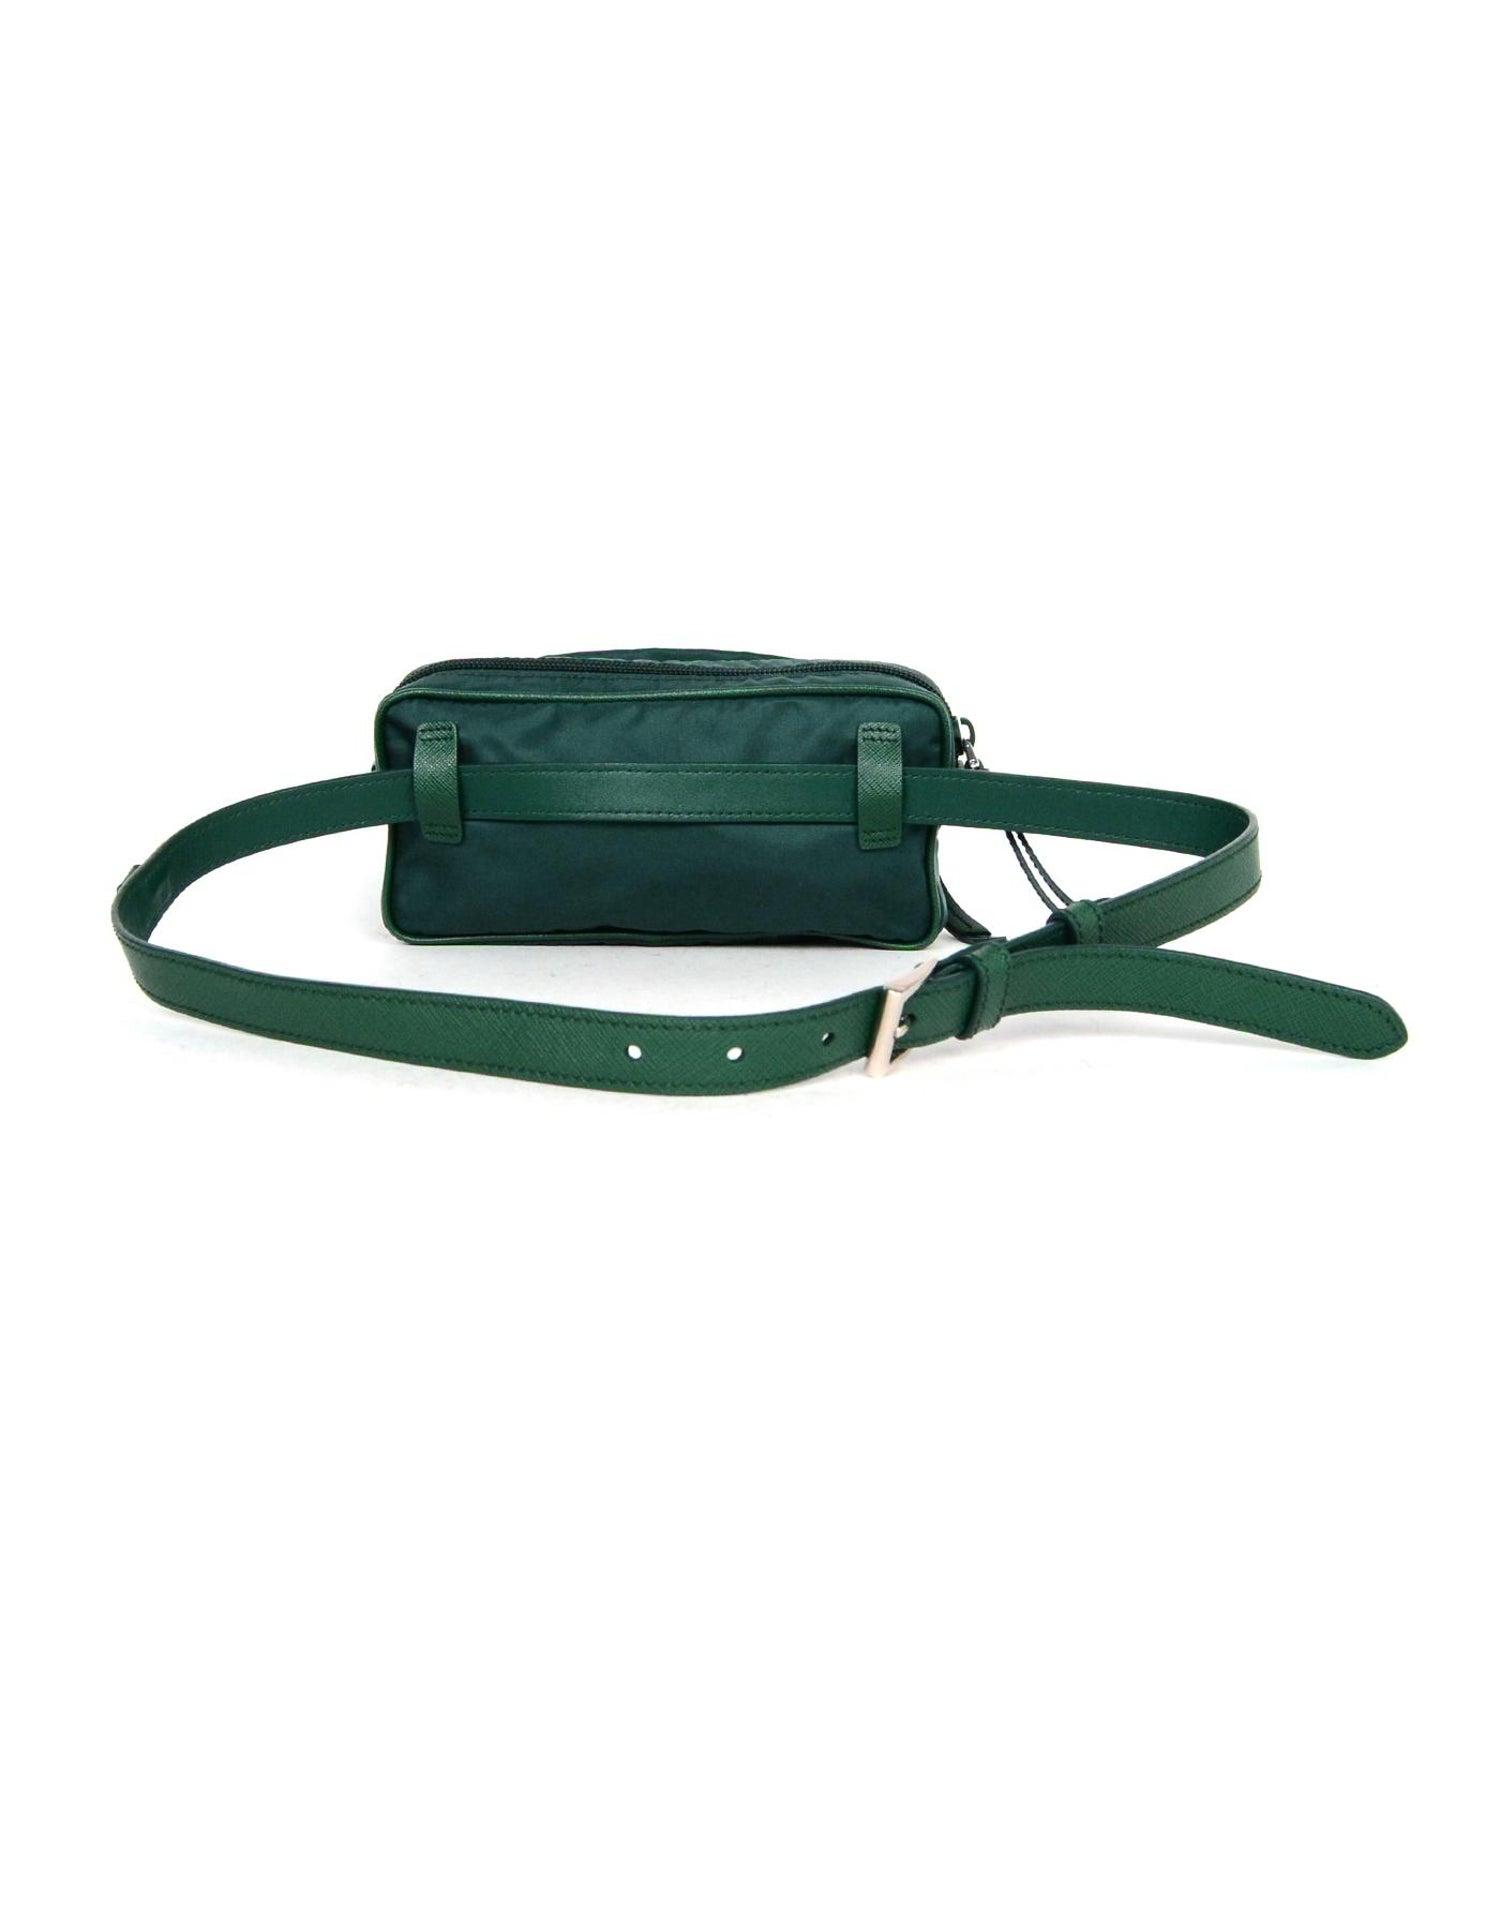 f52a0f3ec3f7 Prada Green Nylon Small Fanny Pack/ Belt Bag 30